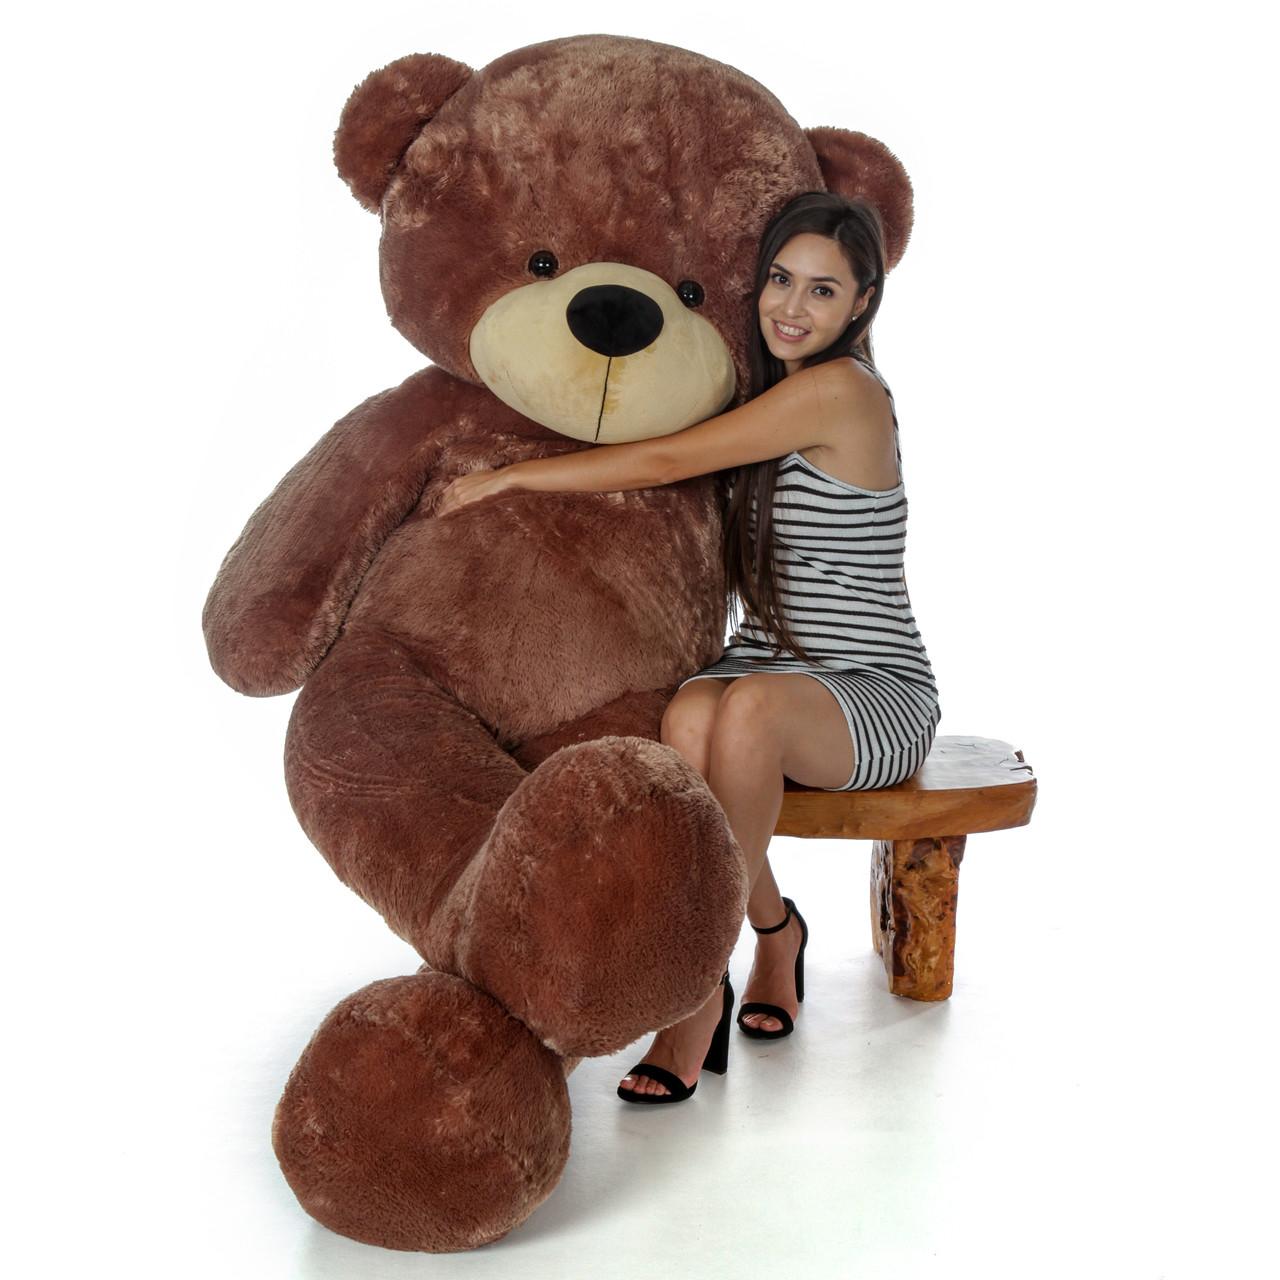 7 Foot Giant Teddy Bear - World's Biggest Teddy Bear